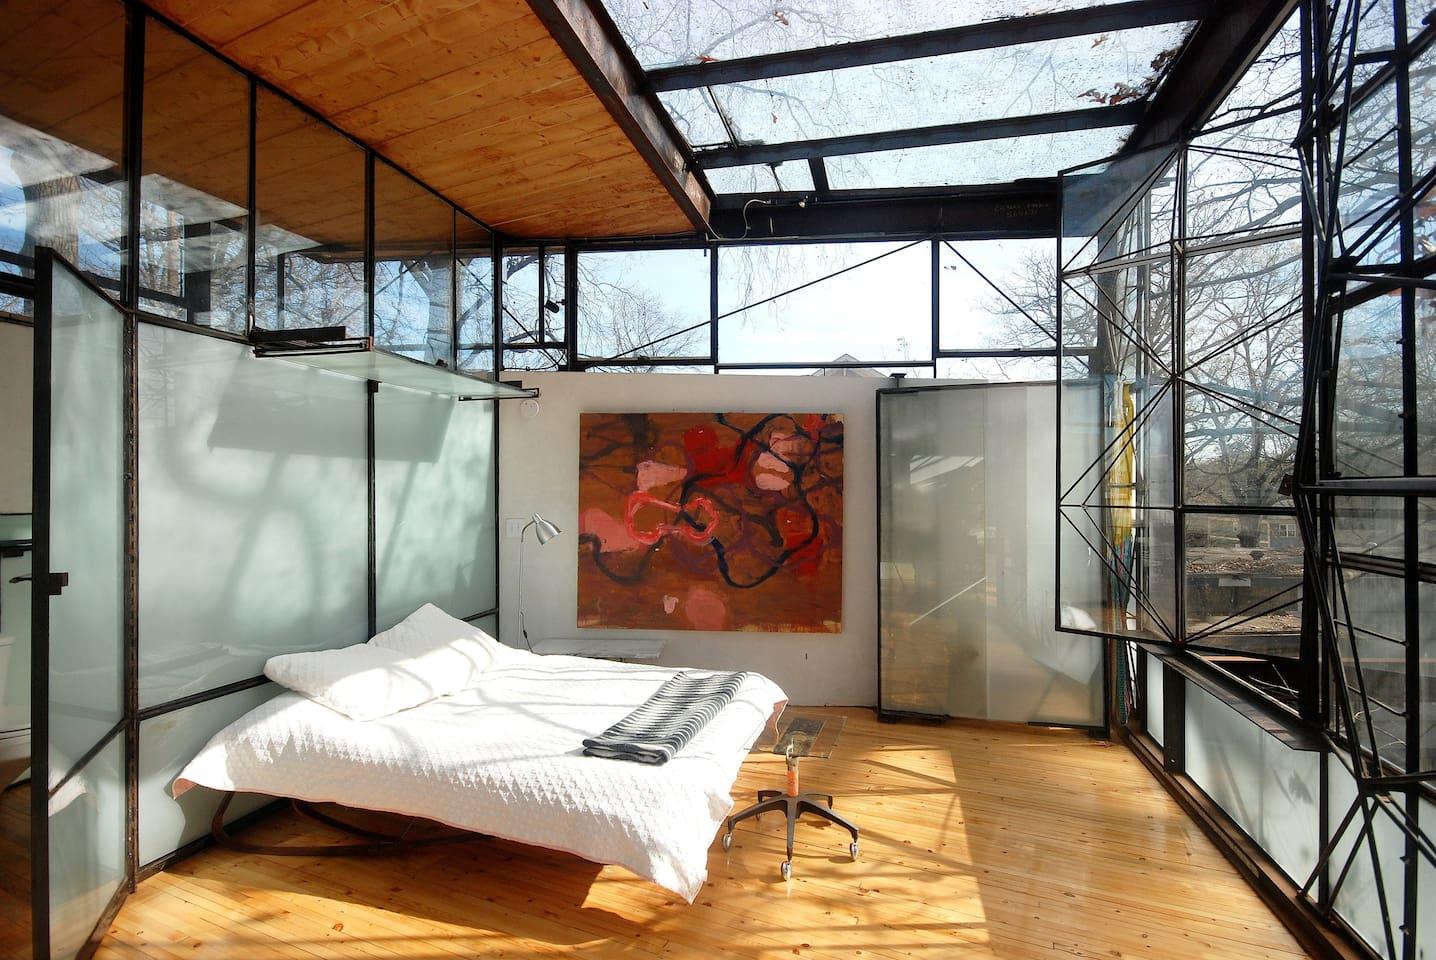 upstairs bedroom and mini closet- bathroom behind glass wall